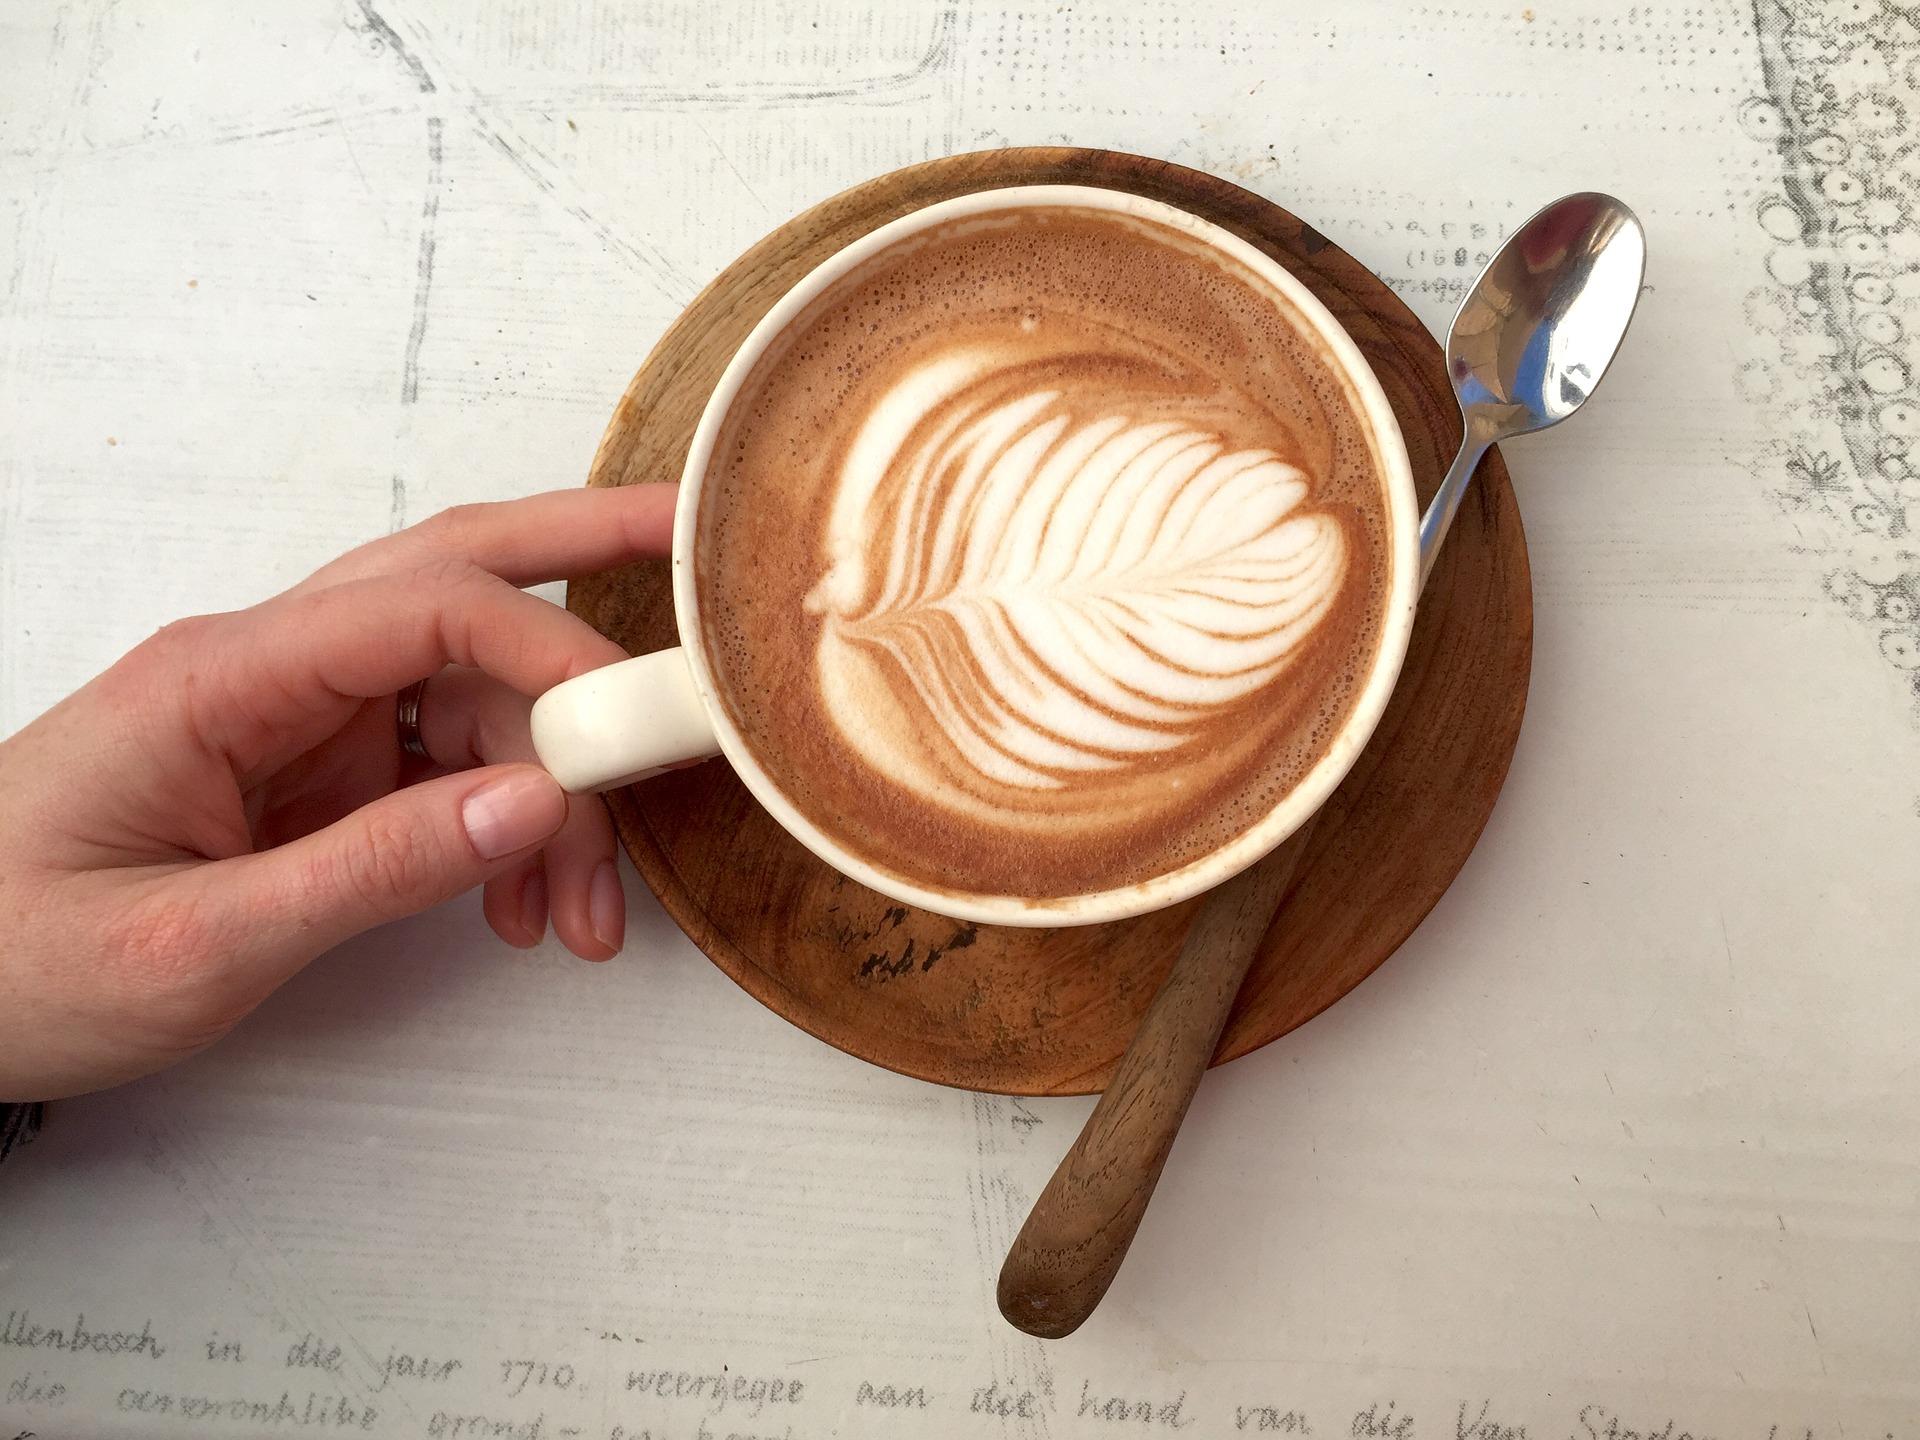 Coffee Statistics - Drinkers